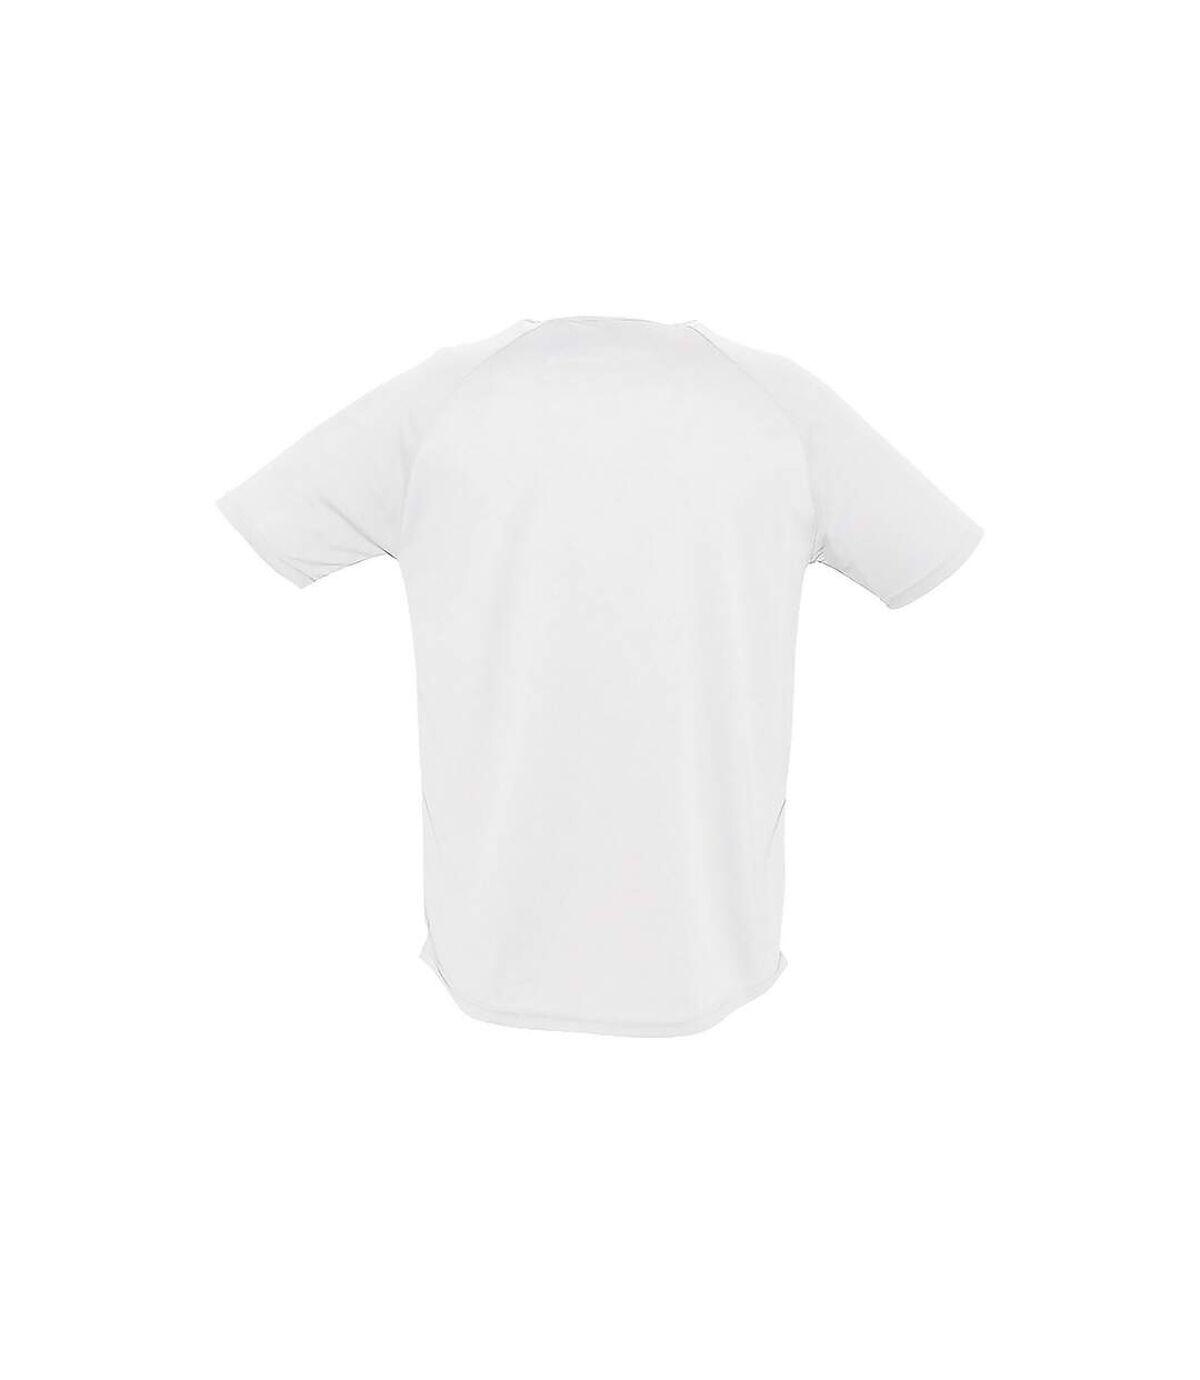 SOLS Mens Sporty Short Sleeve Performance T-Shirt (White) - UTPC303